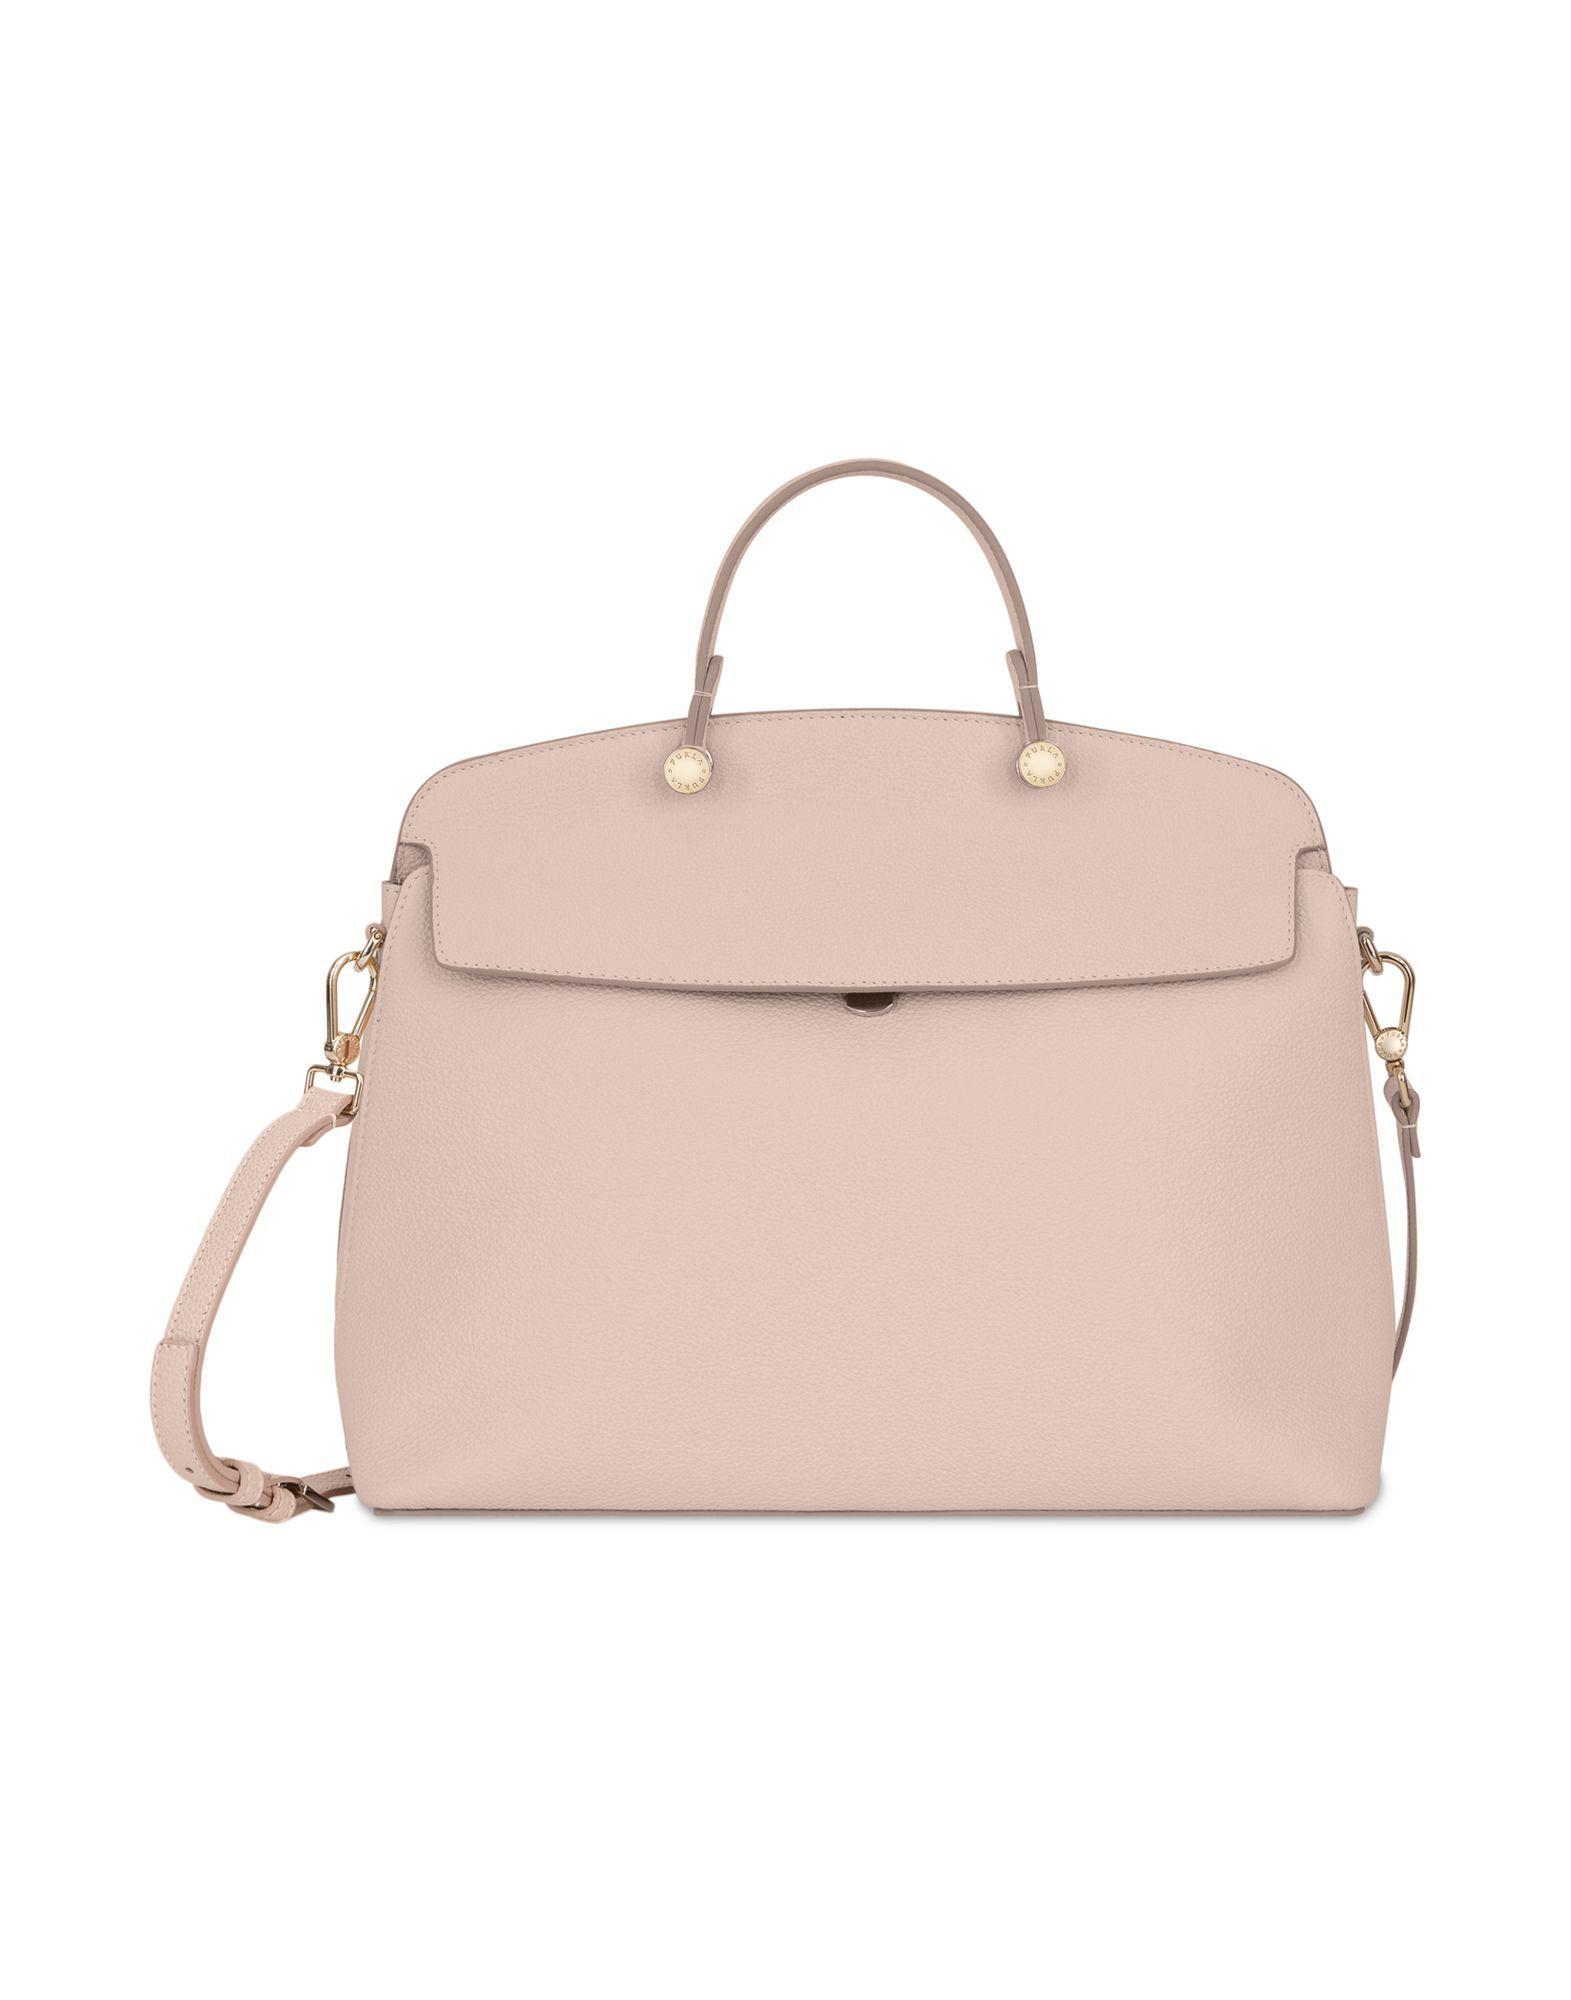 Furla Handbags In Pale Pink